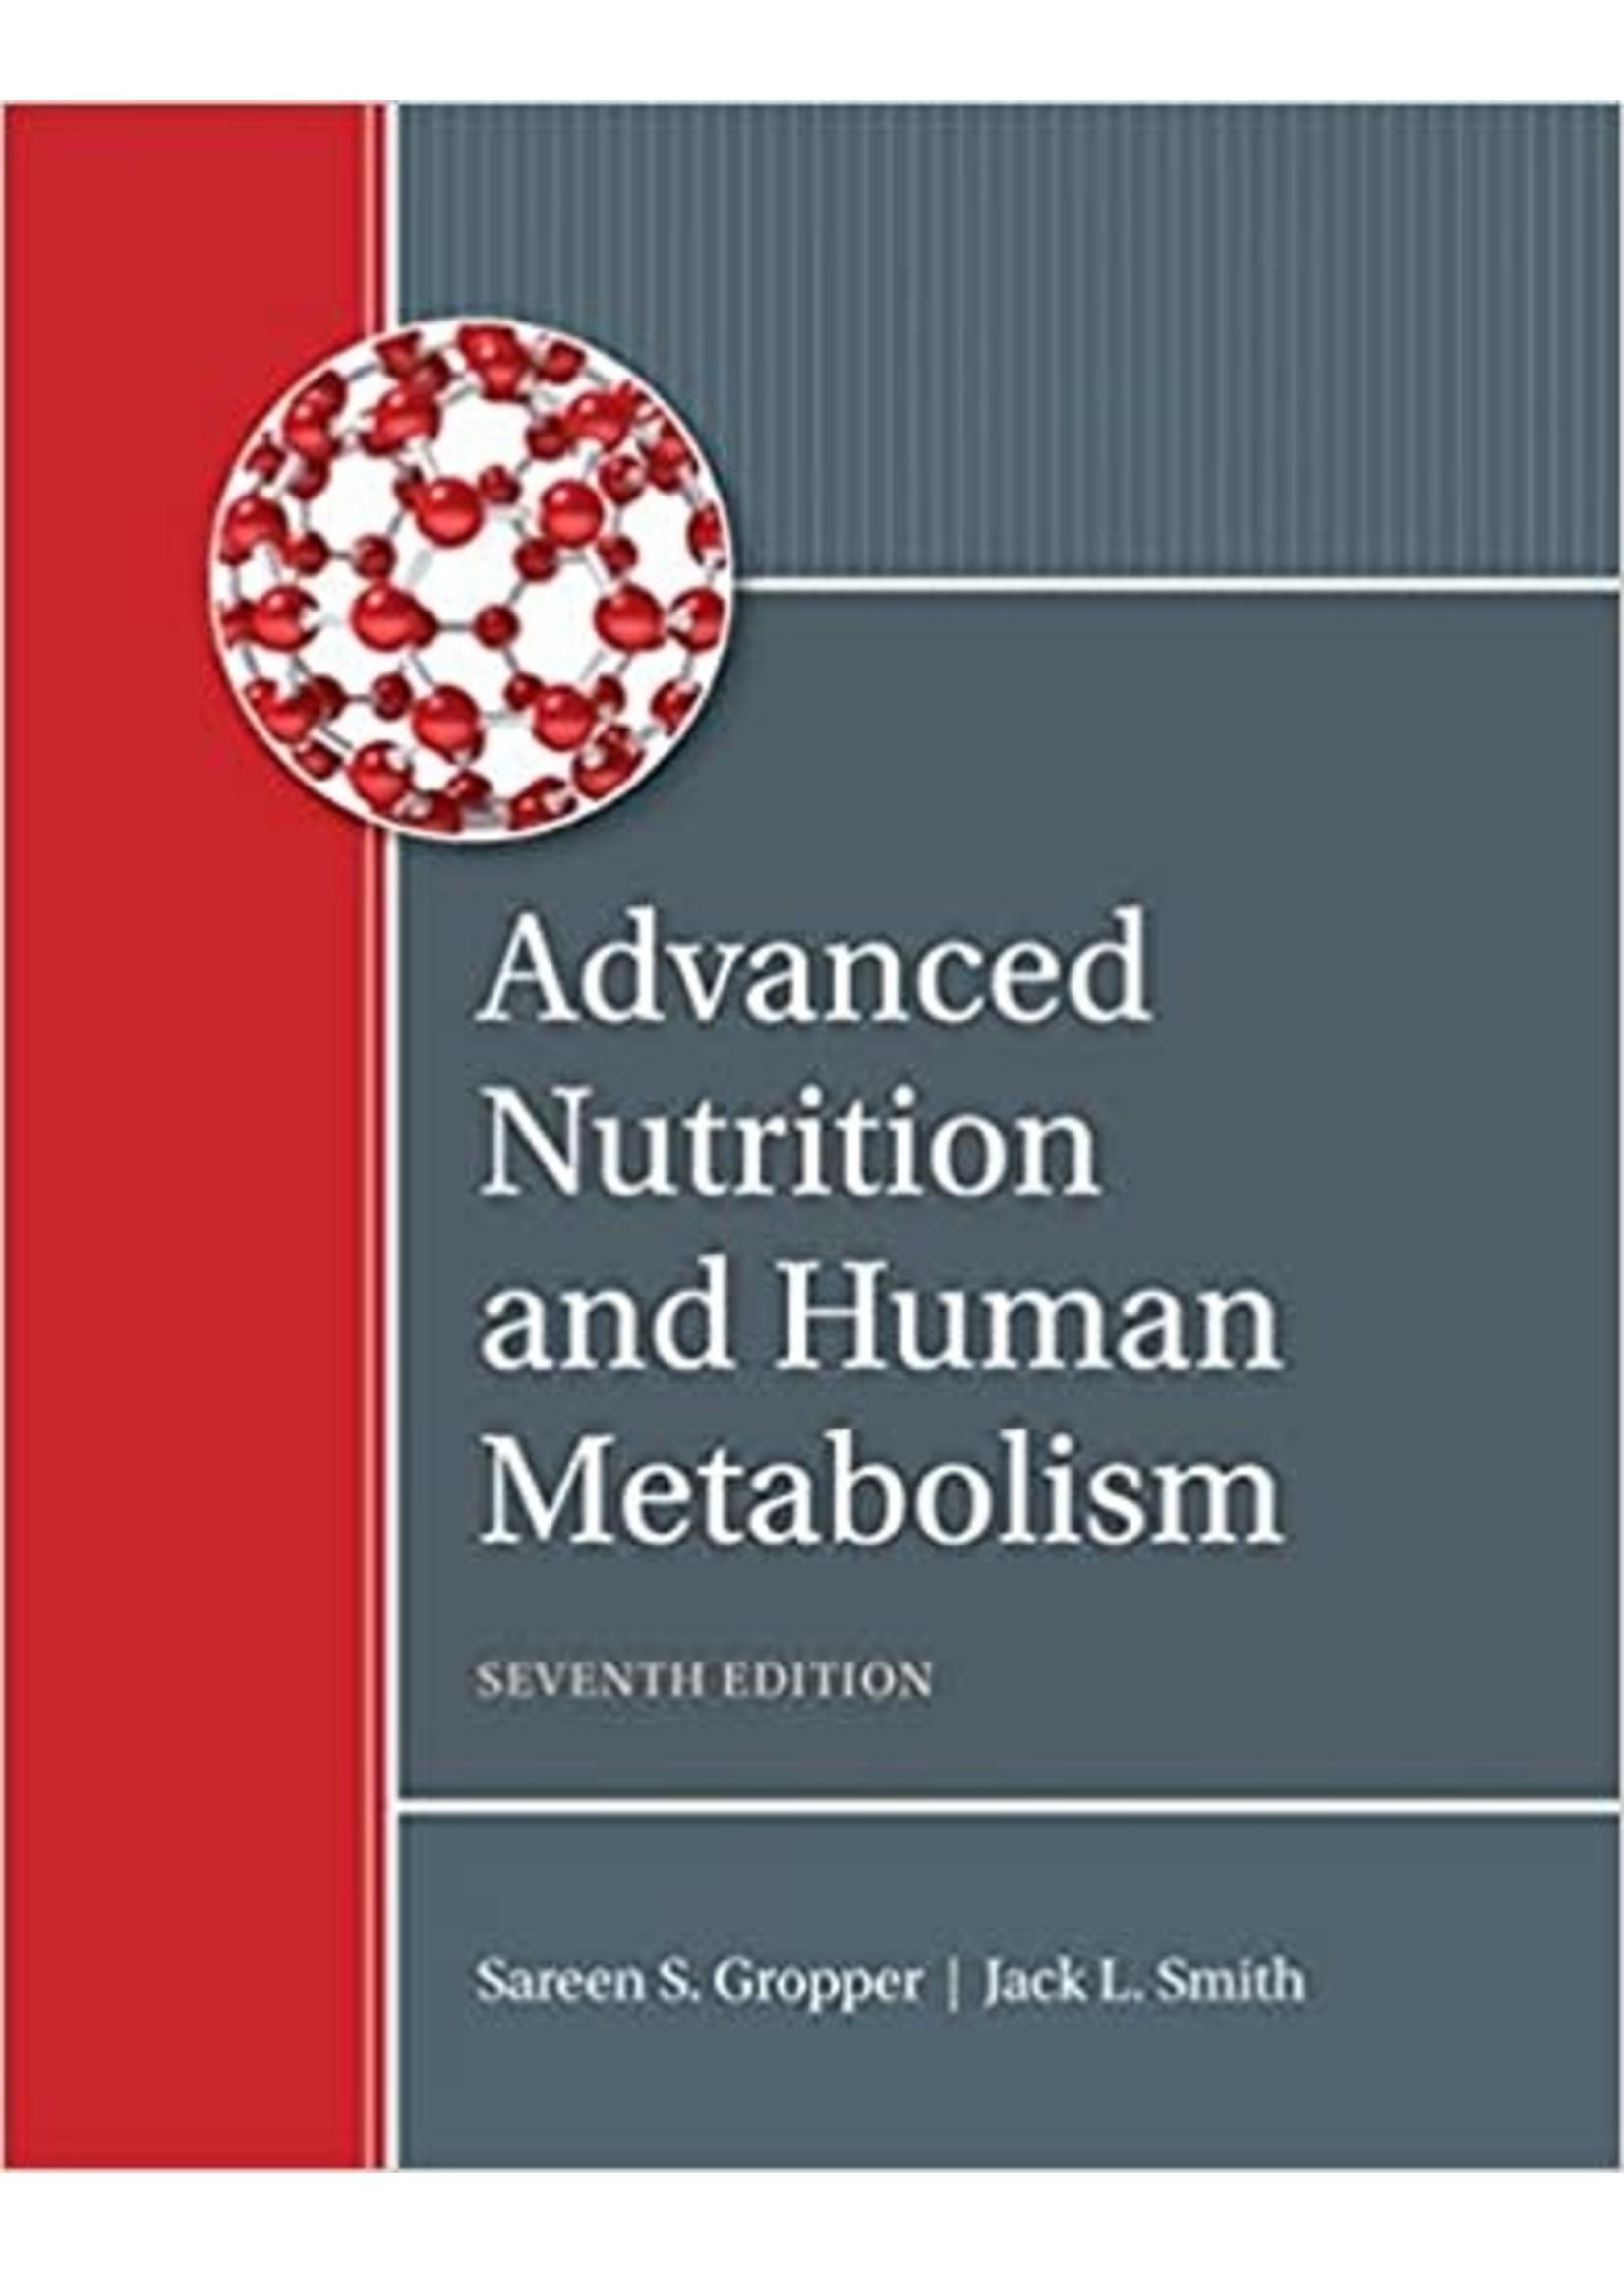 EXNS473 ADVANCED NUTRITION - HUMAN METABOLISM